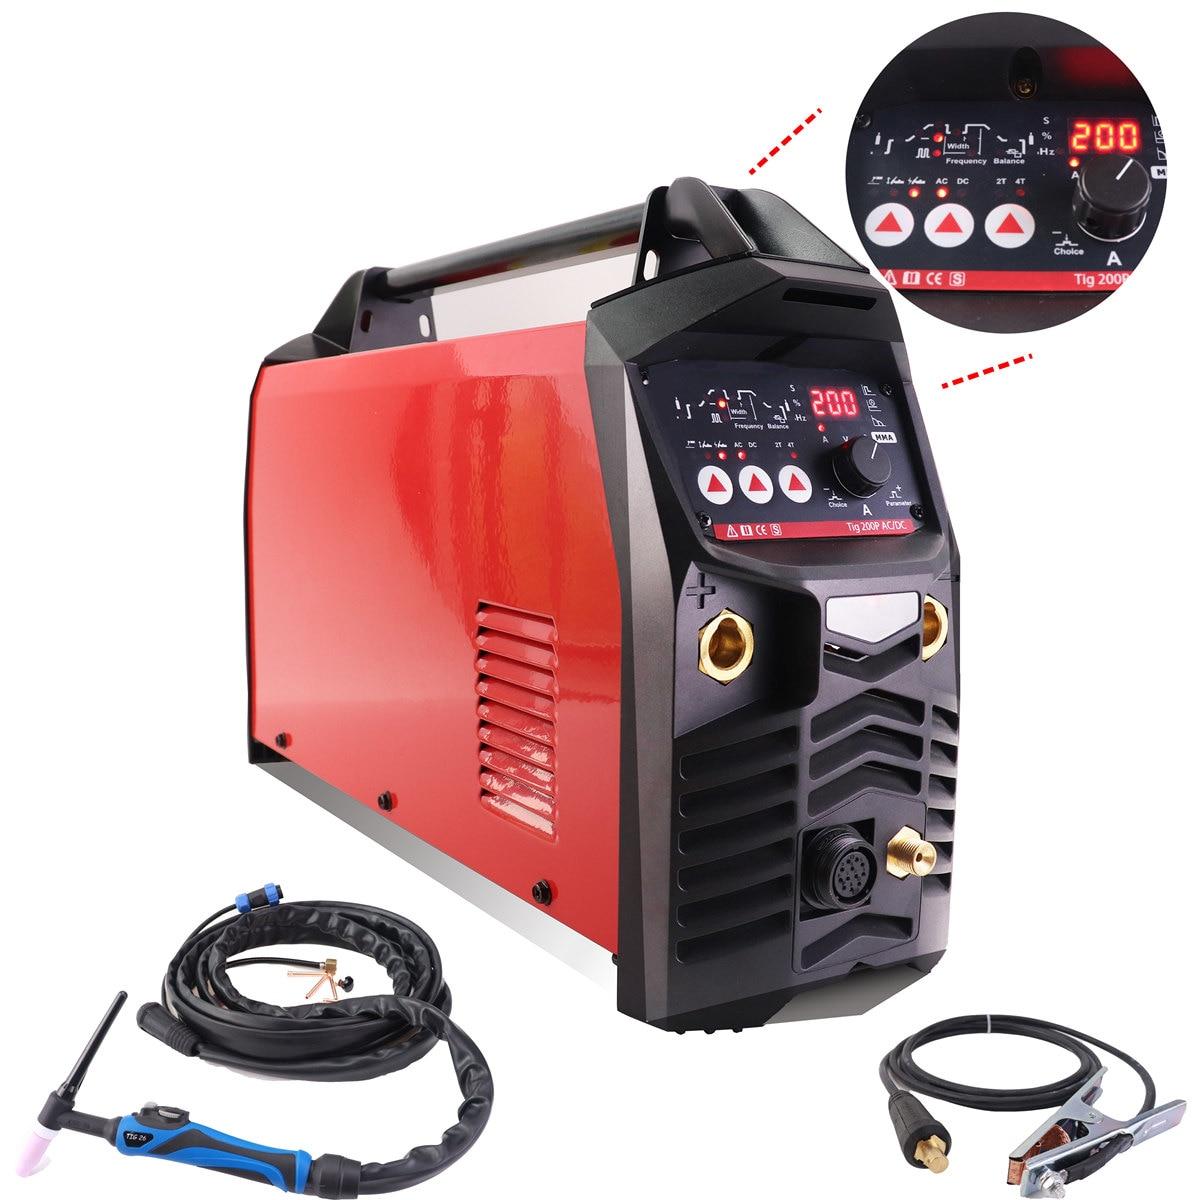 Aluminium Welder ACDC TIG Welding Machine 200A Digital Pulse TIG MMA CE Approved Professional AC DC Pulse TIG Welding Machine